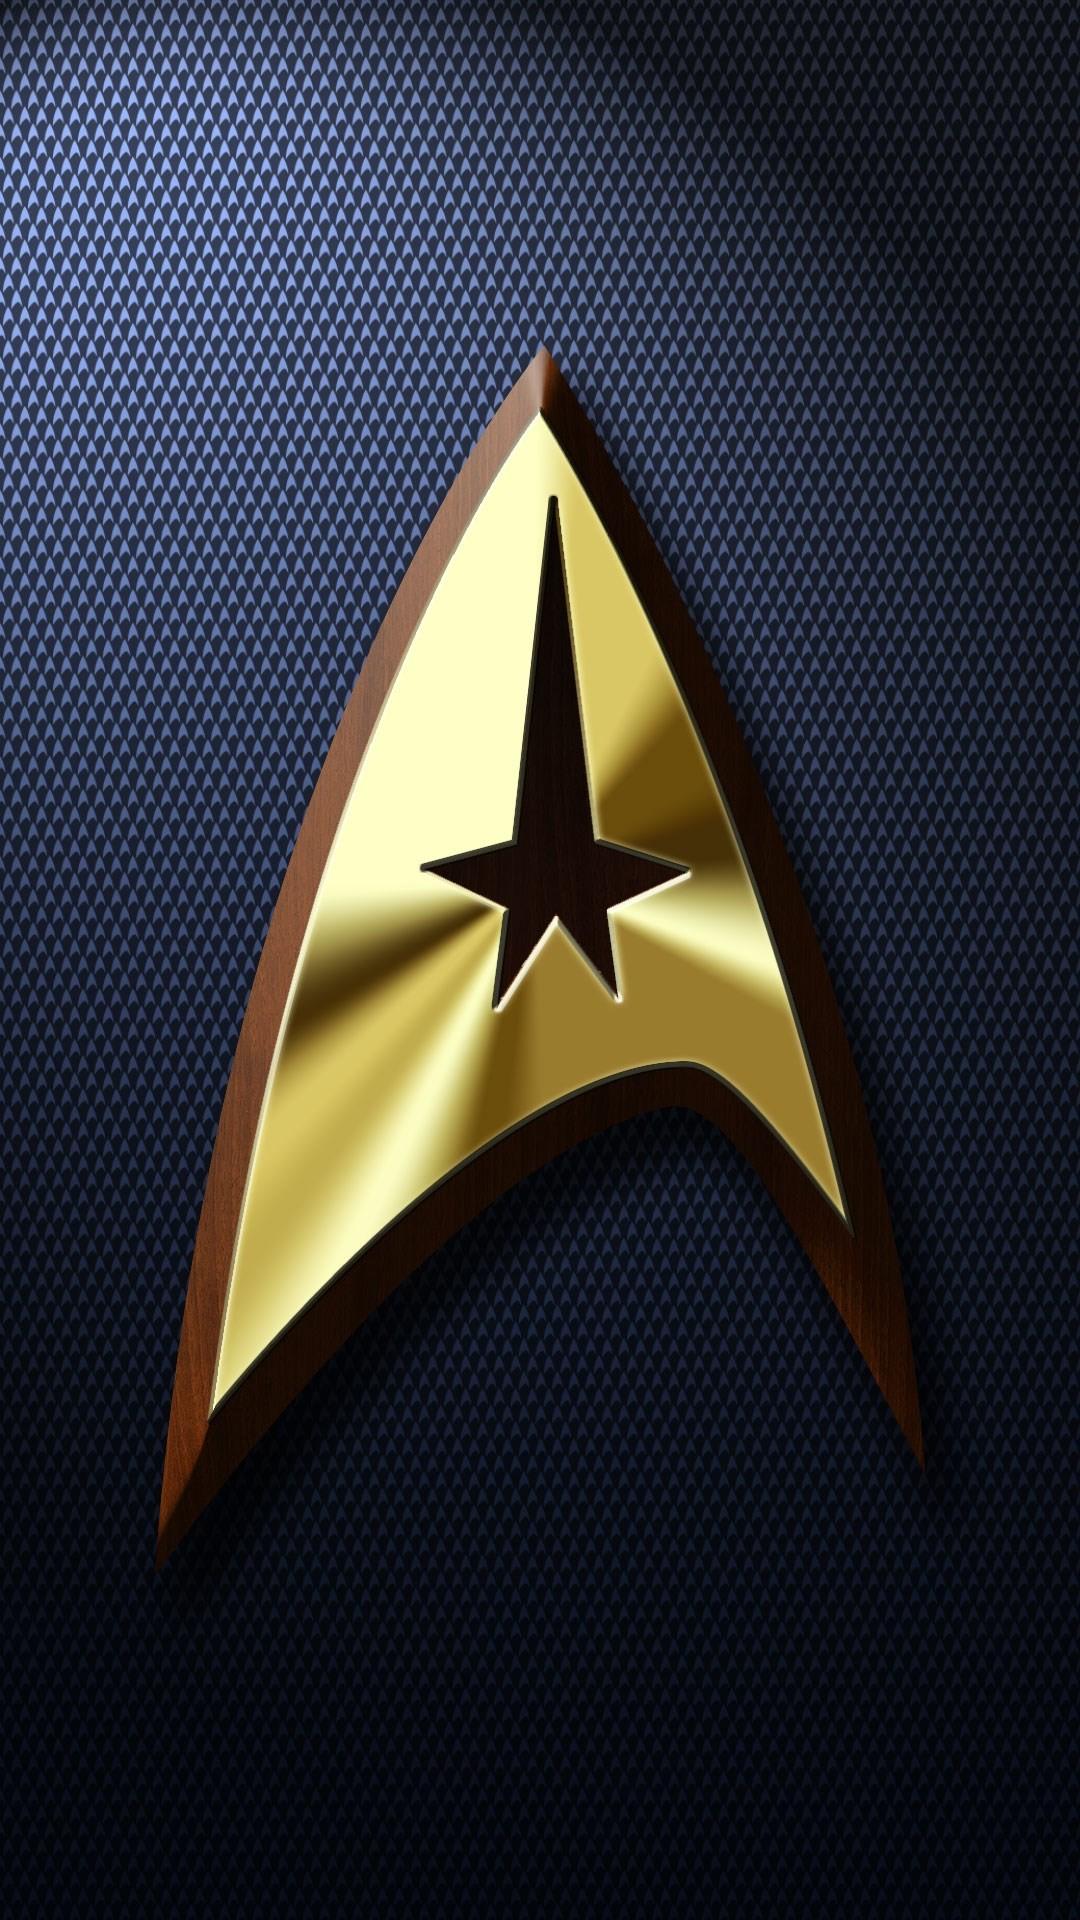 star trek phone wallpaper …